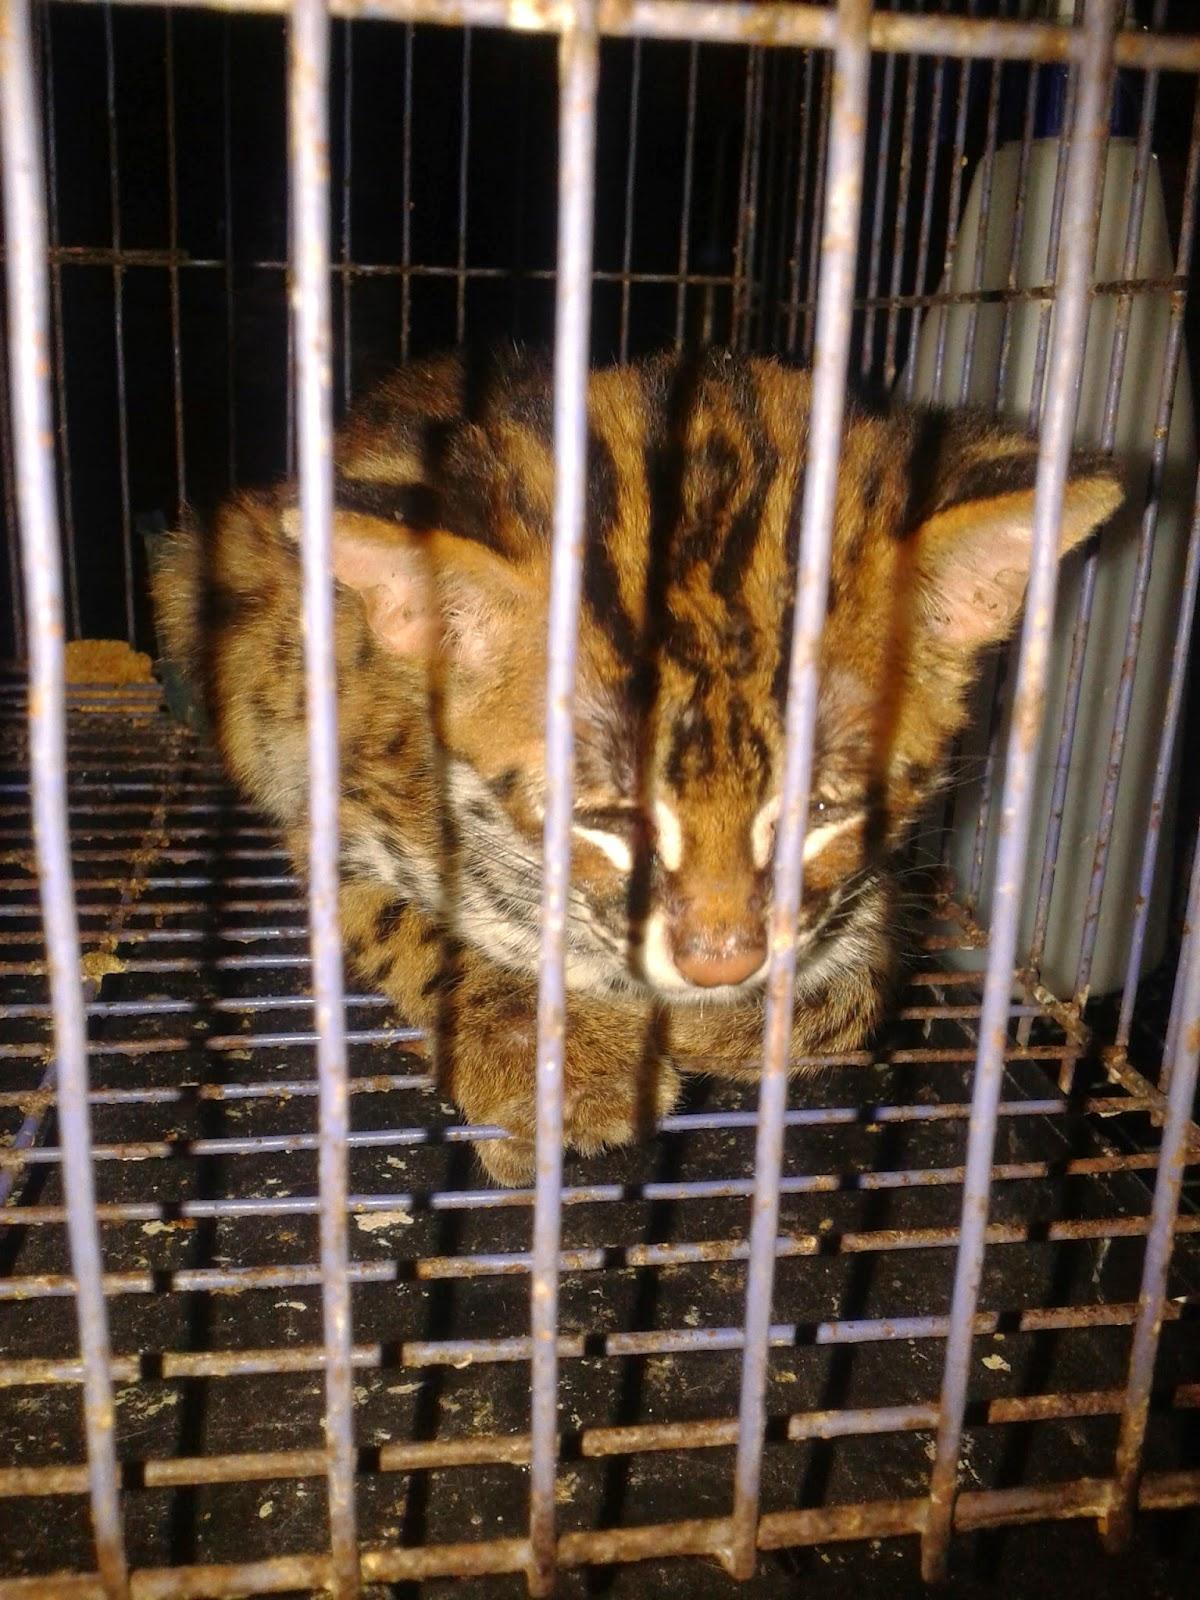 Alfredyansyah Jual Murah Kucing Hutan Blacan Macan Akar